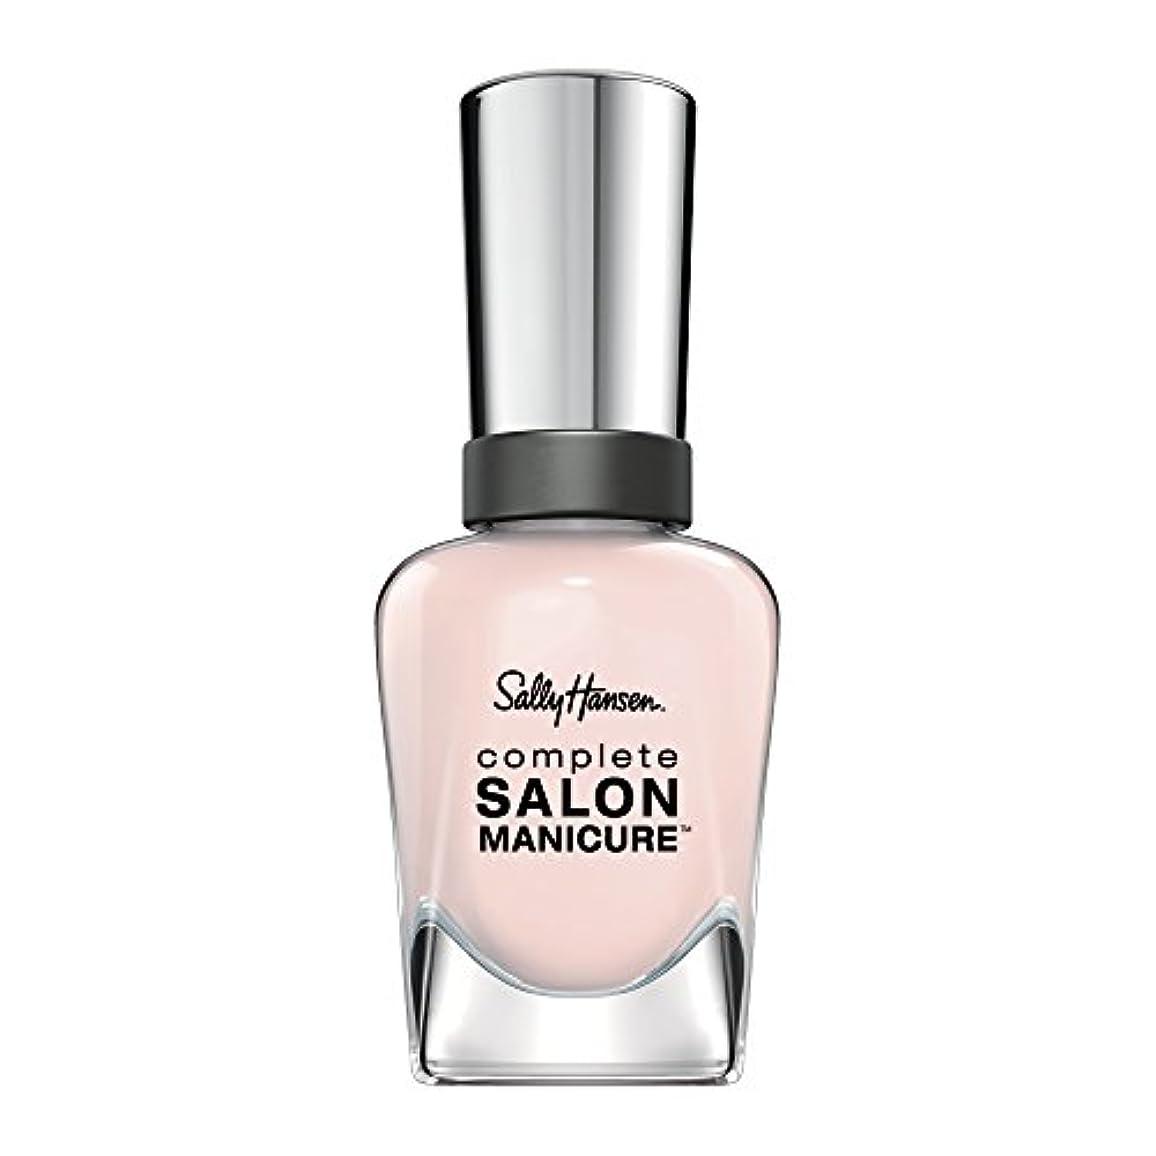 SALLY HANSEN COMPLETE SALON MANICURE NAIL COLOR #340 SWEET TALKER